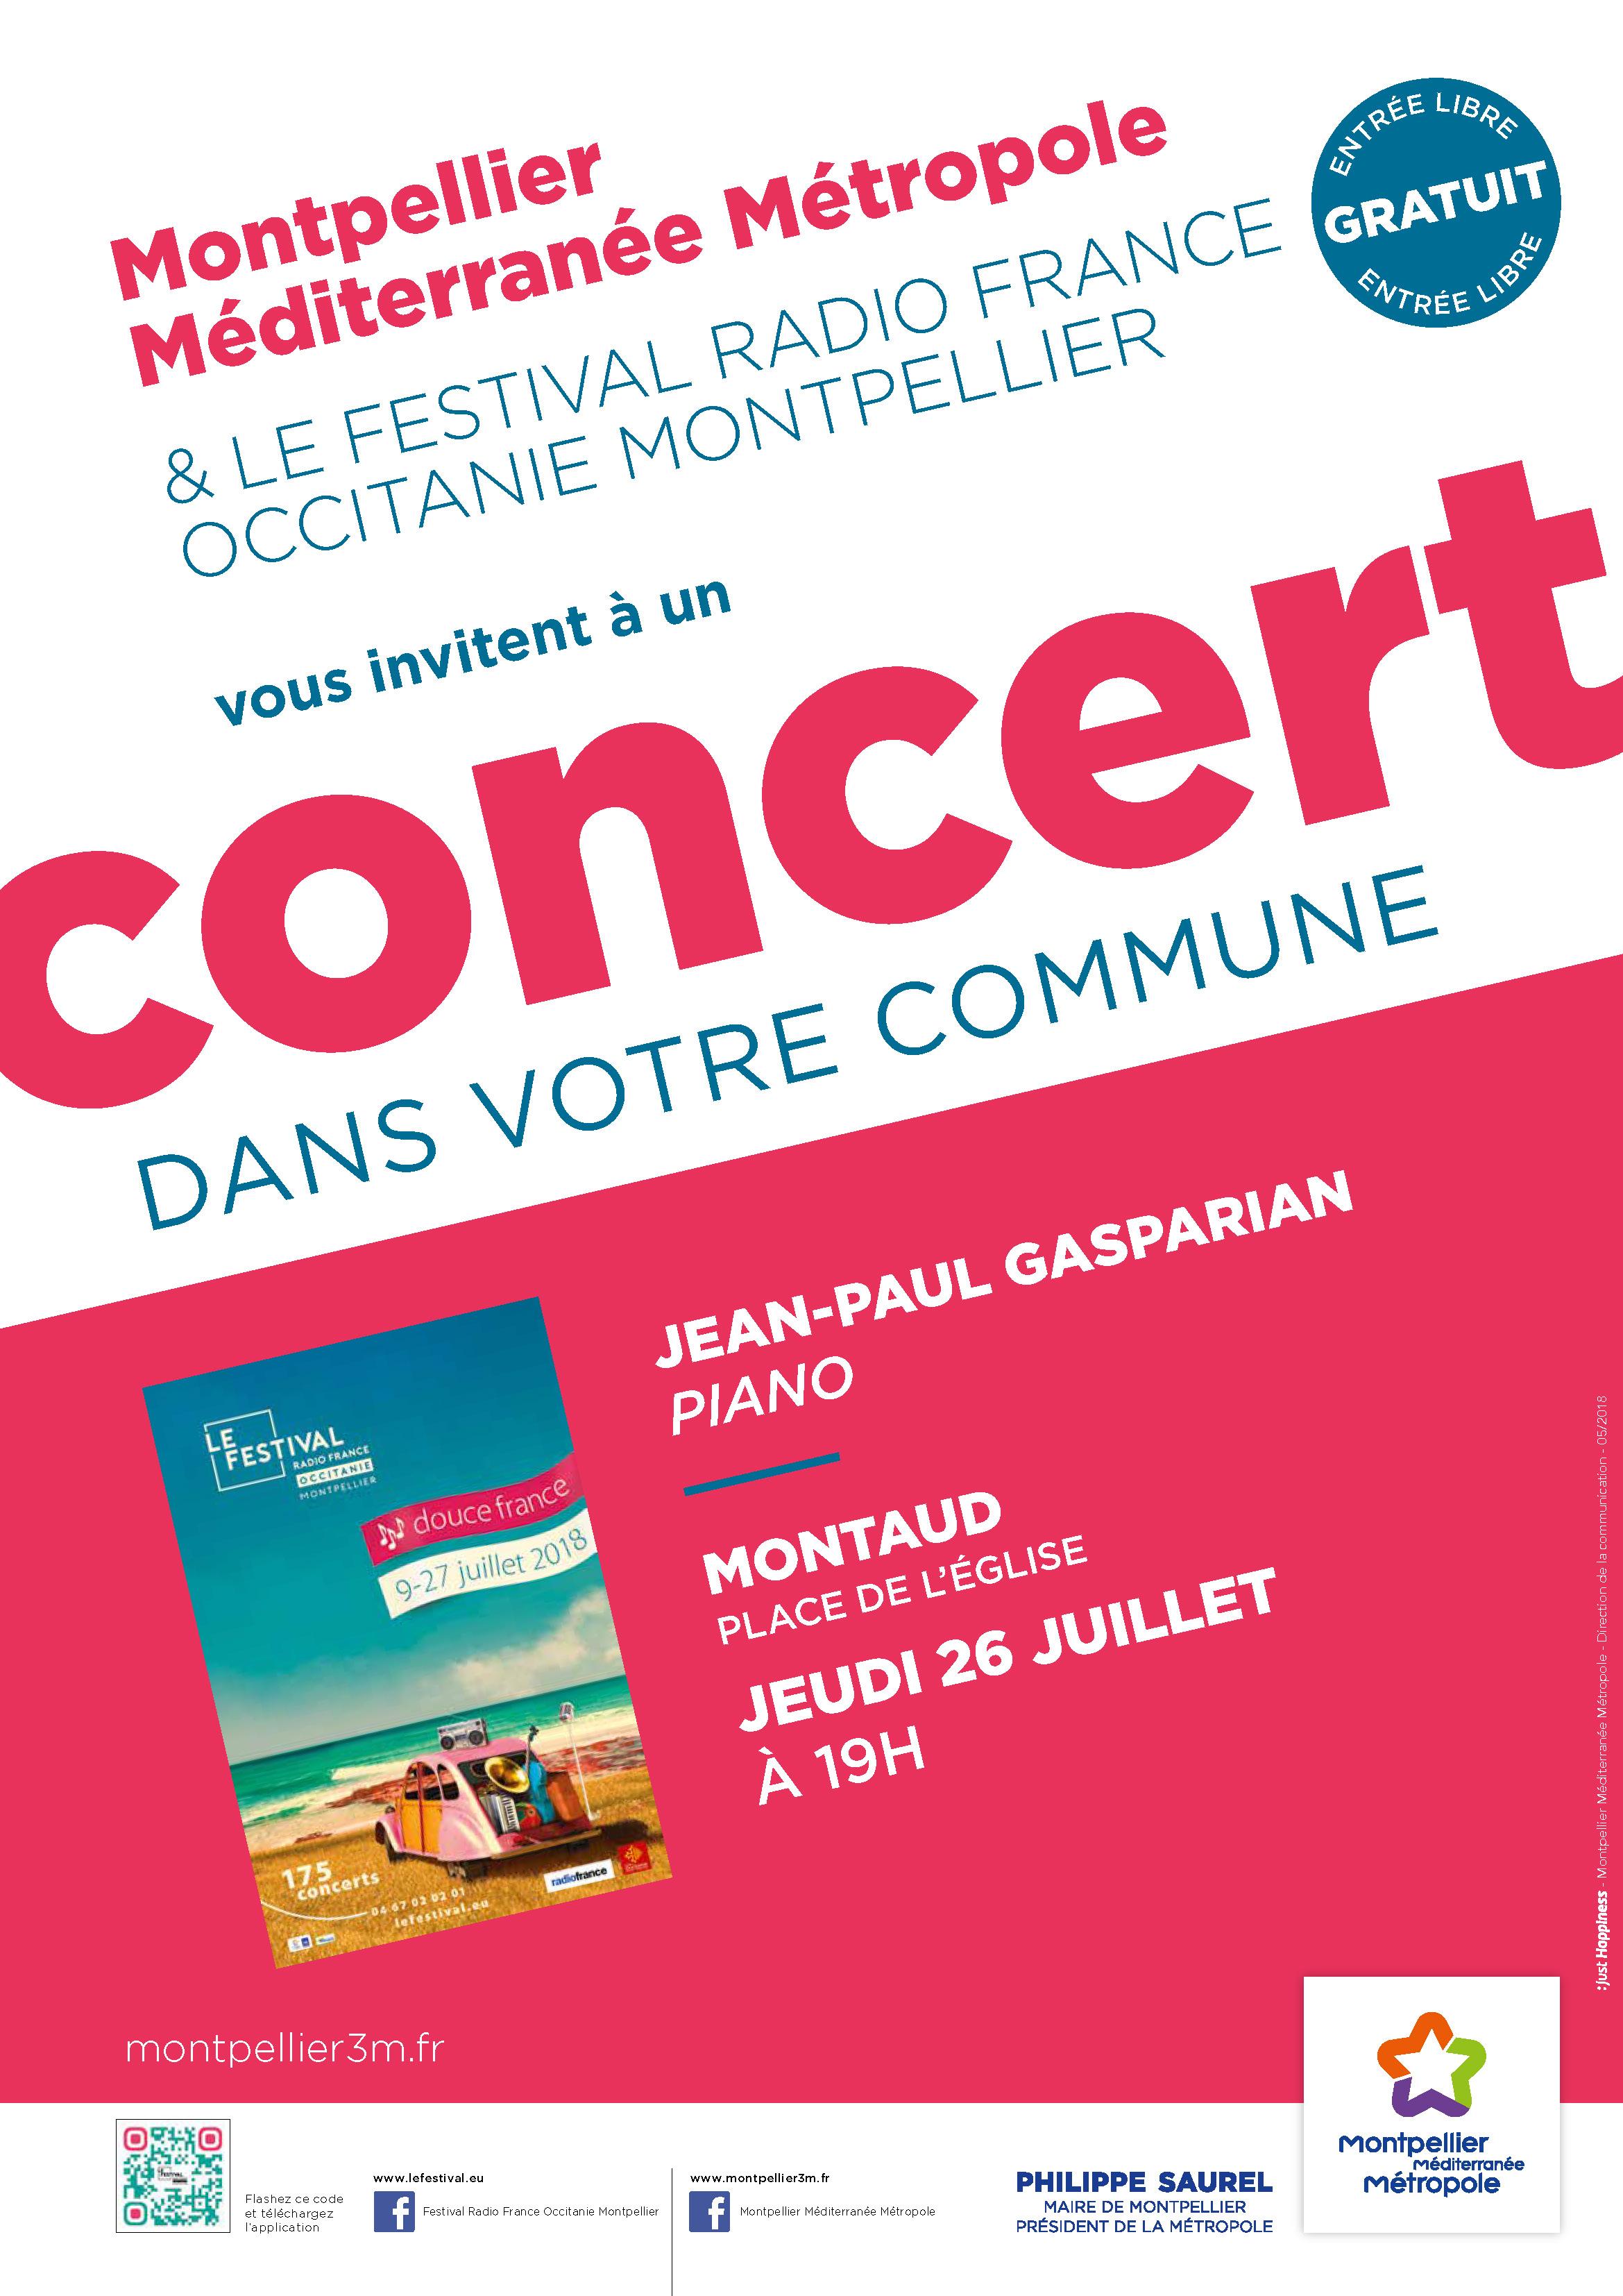 Festival Radio France Occitanie Montpellier | JEAN-PAUL GASPARIAN